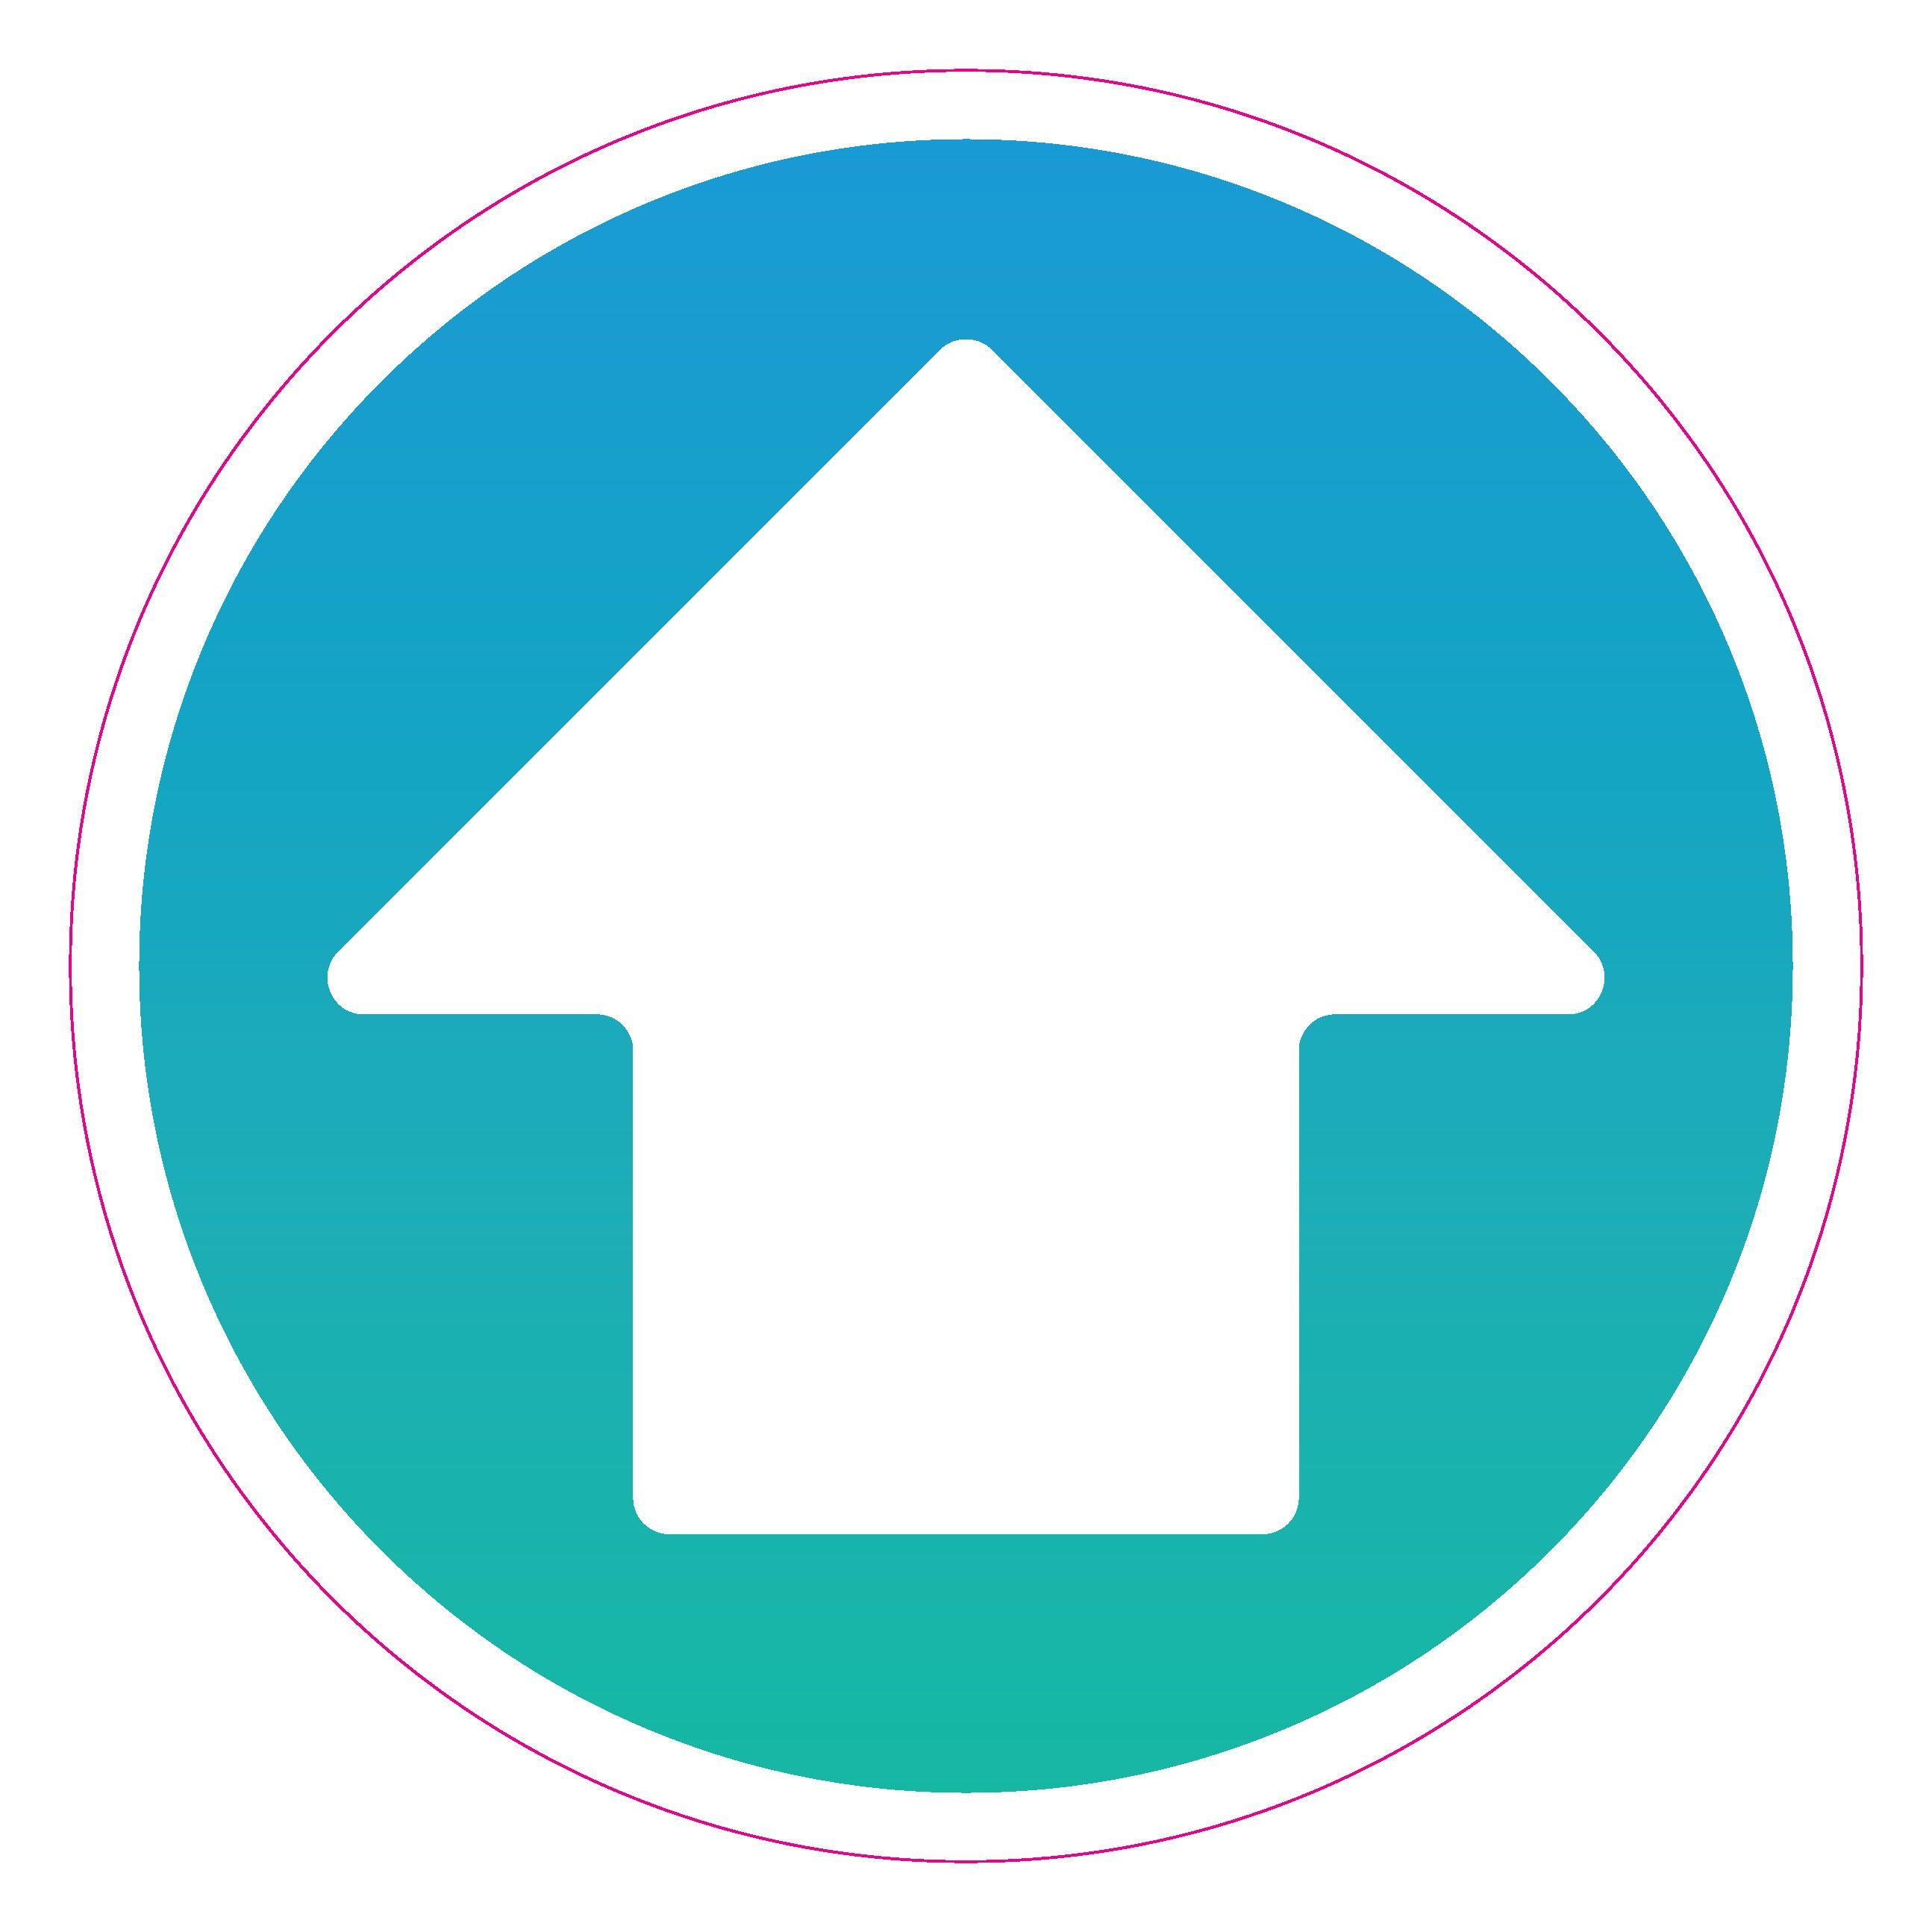 Traffic shaping arrows